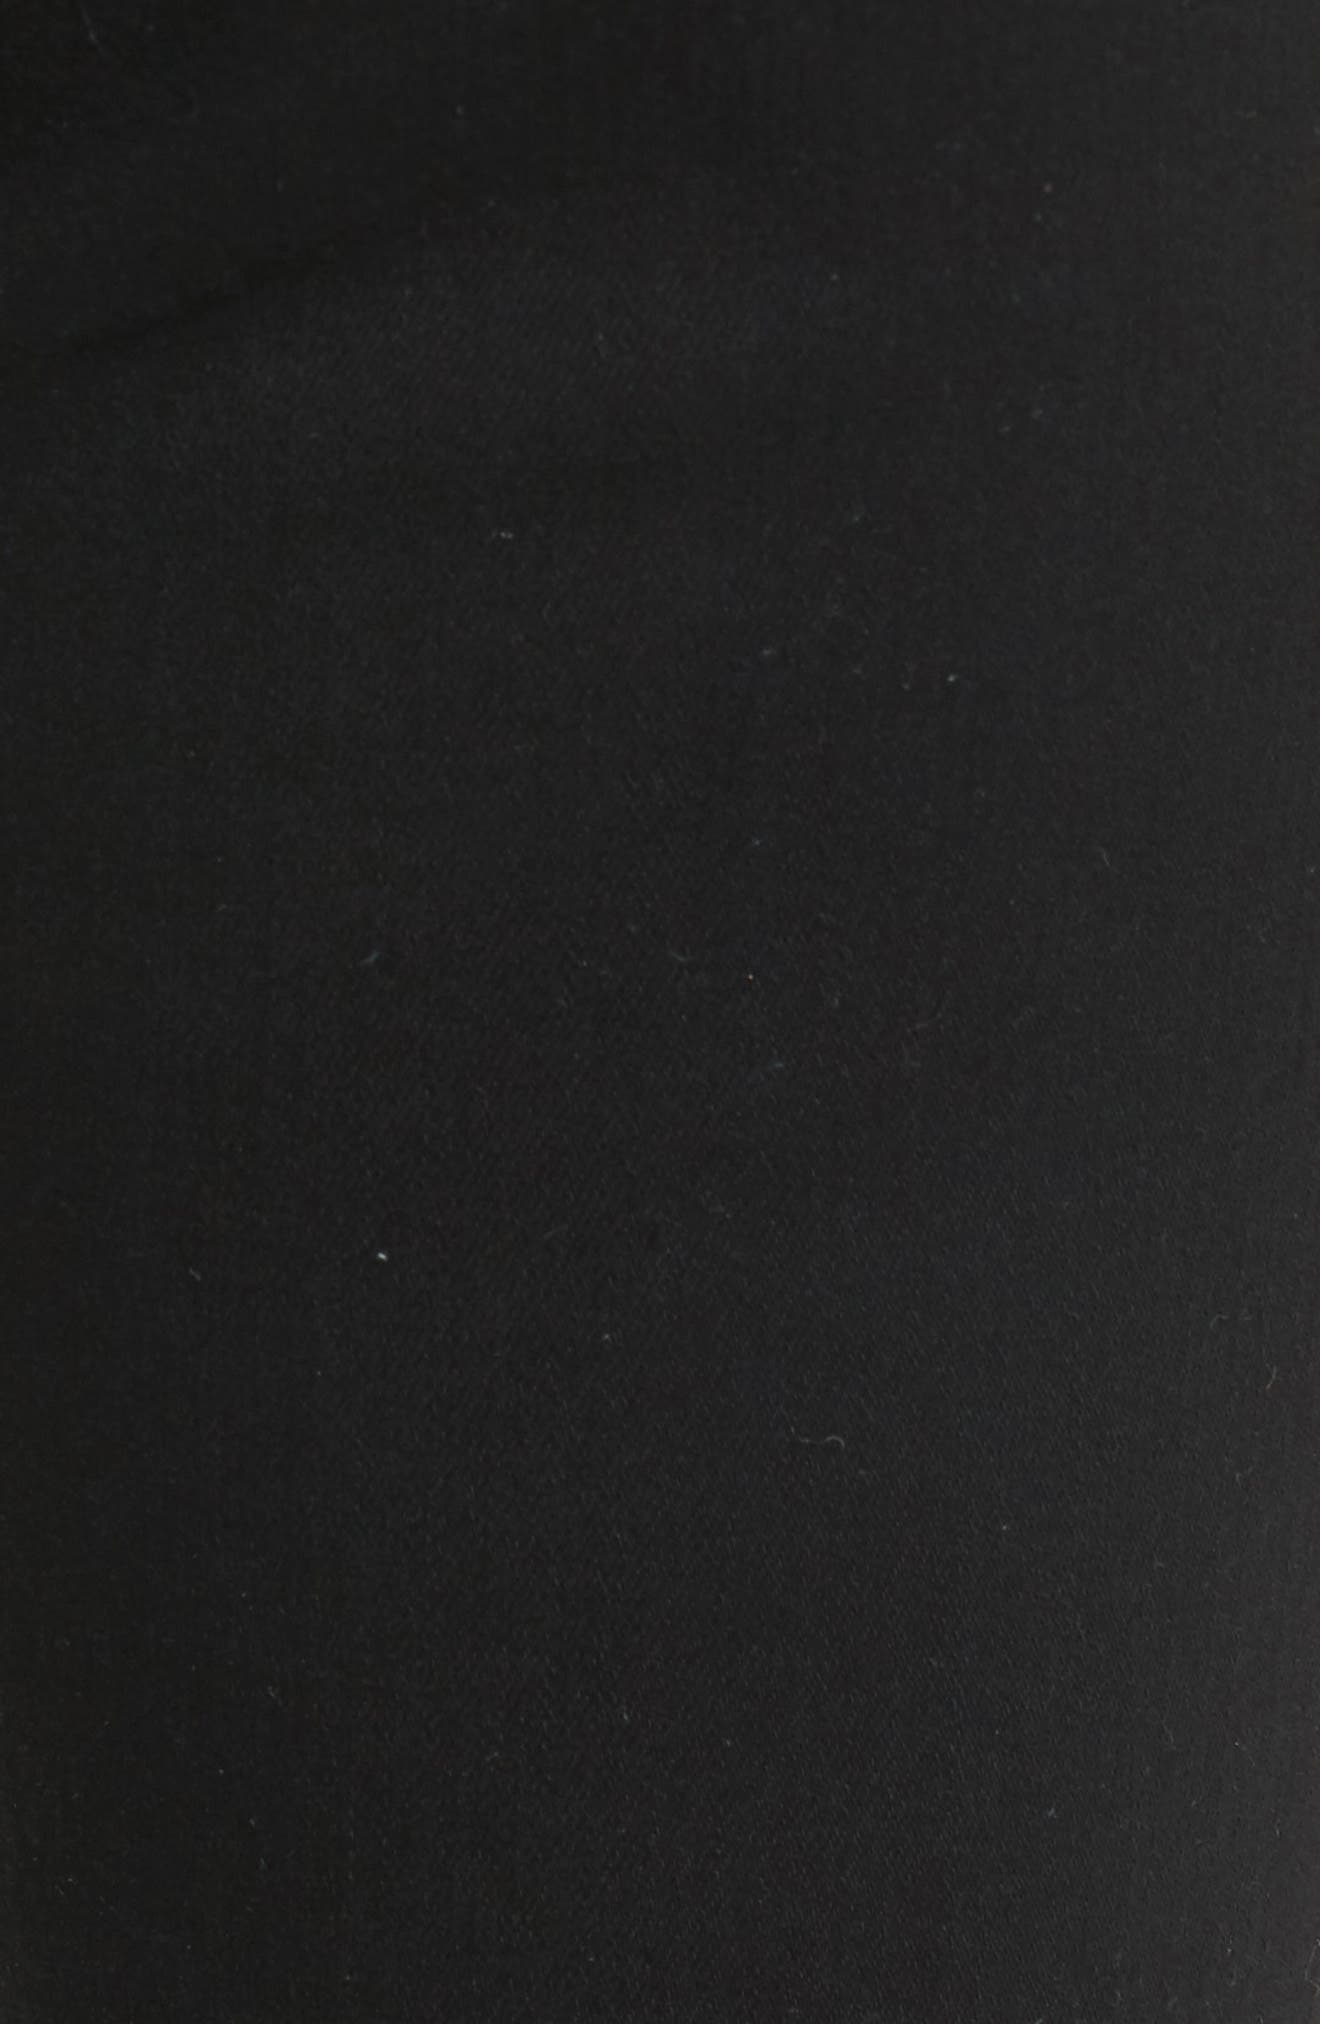 Prima Mid Rise Cigarette Jeans,                             Alternate thumbnail 6, color,                             5 YEARS BLACK DESTRUCTED